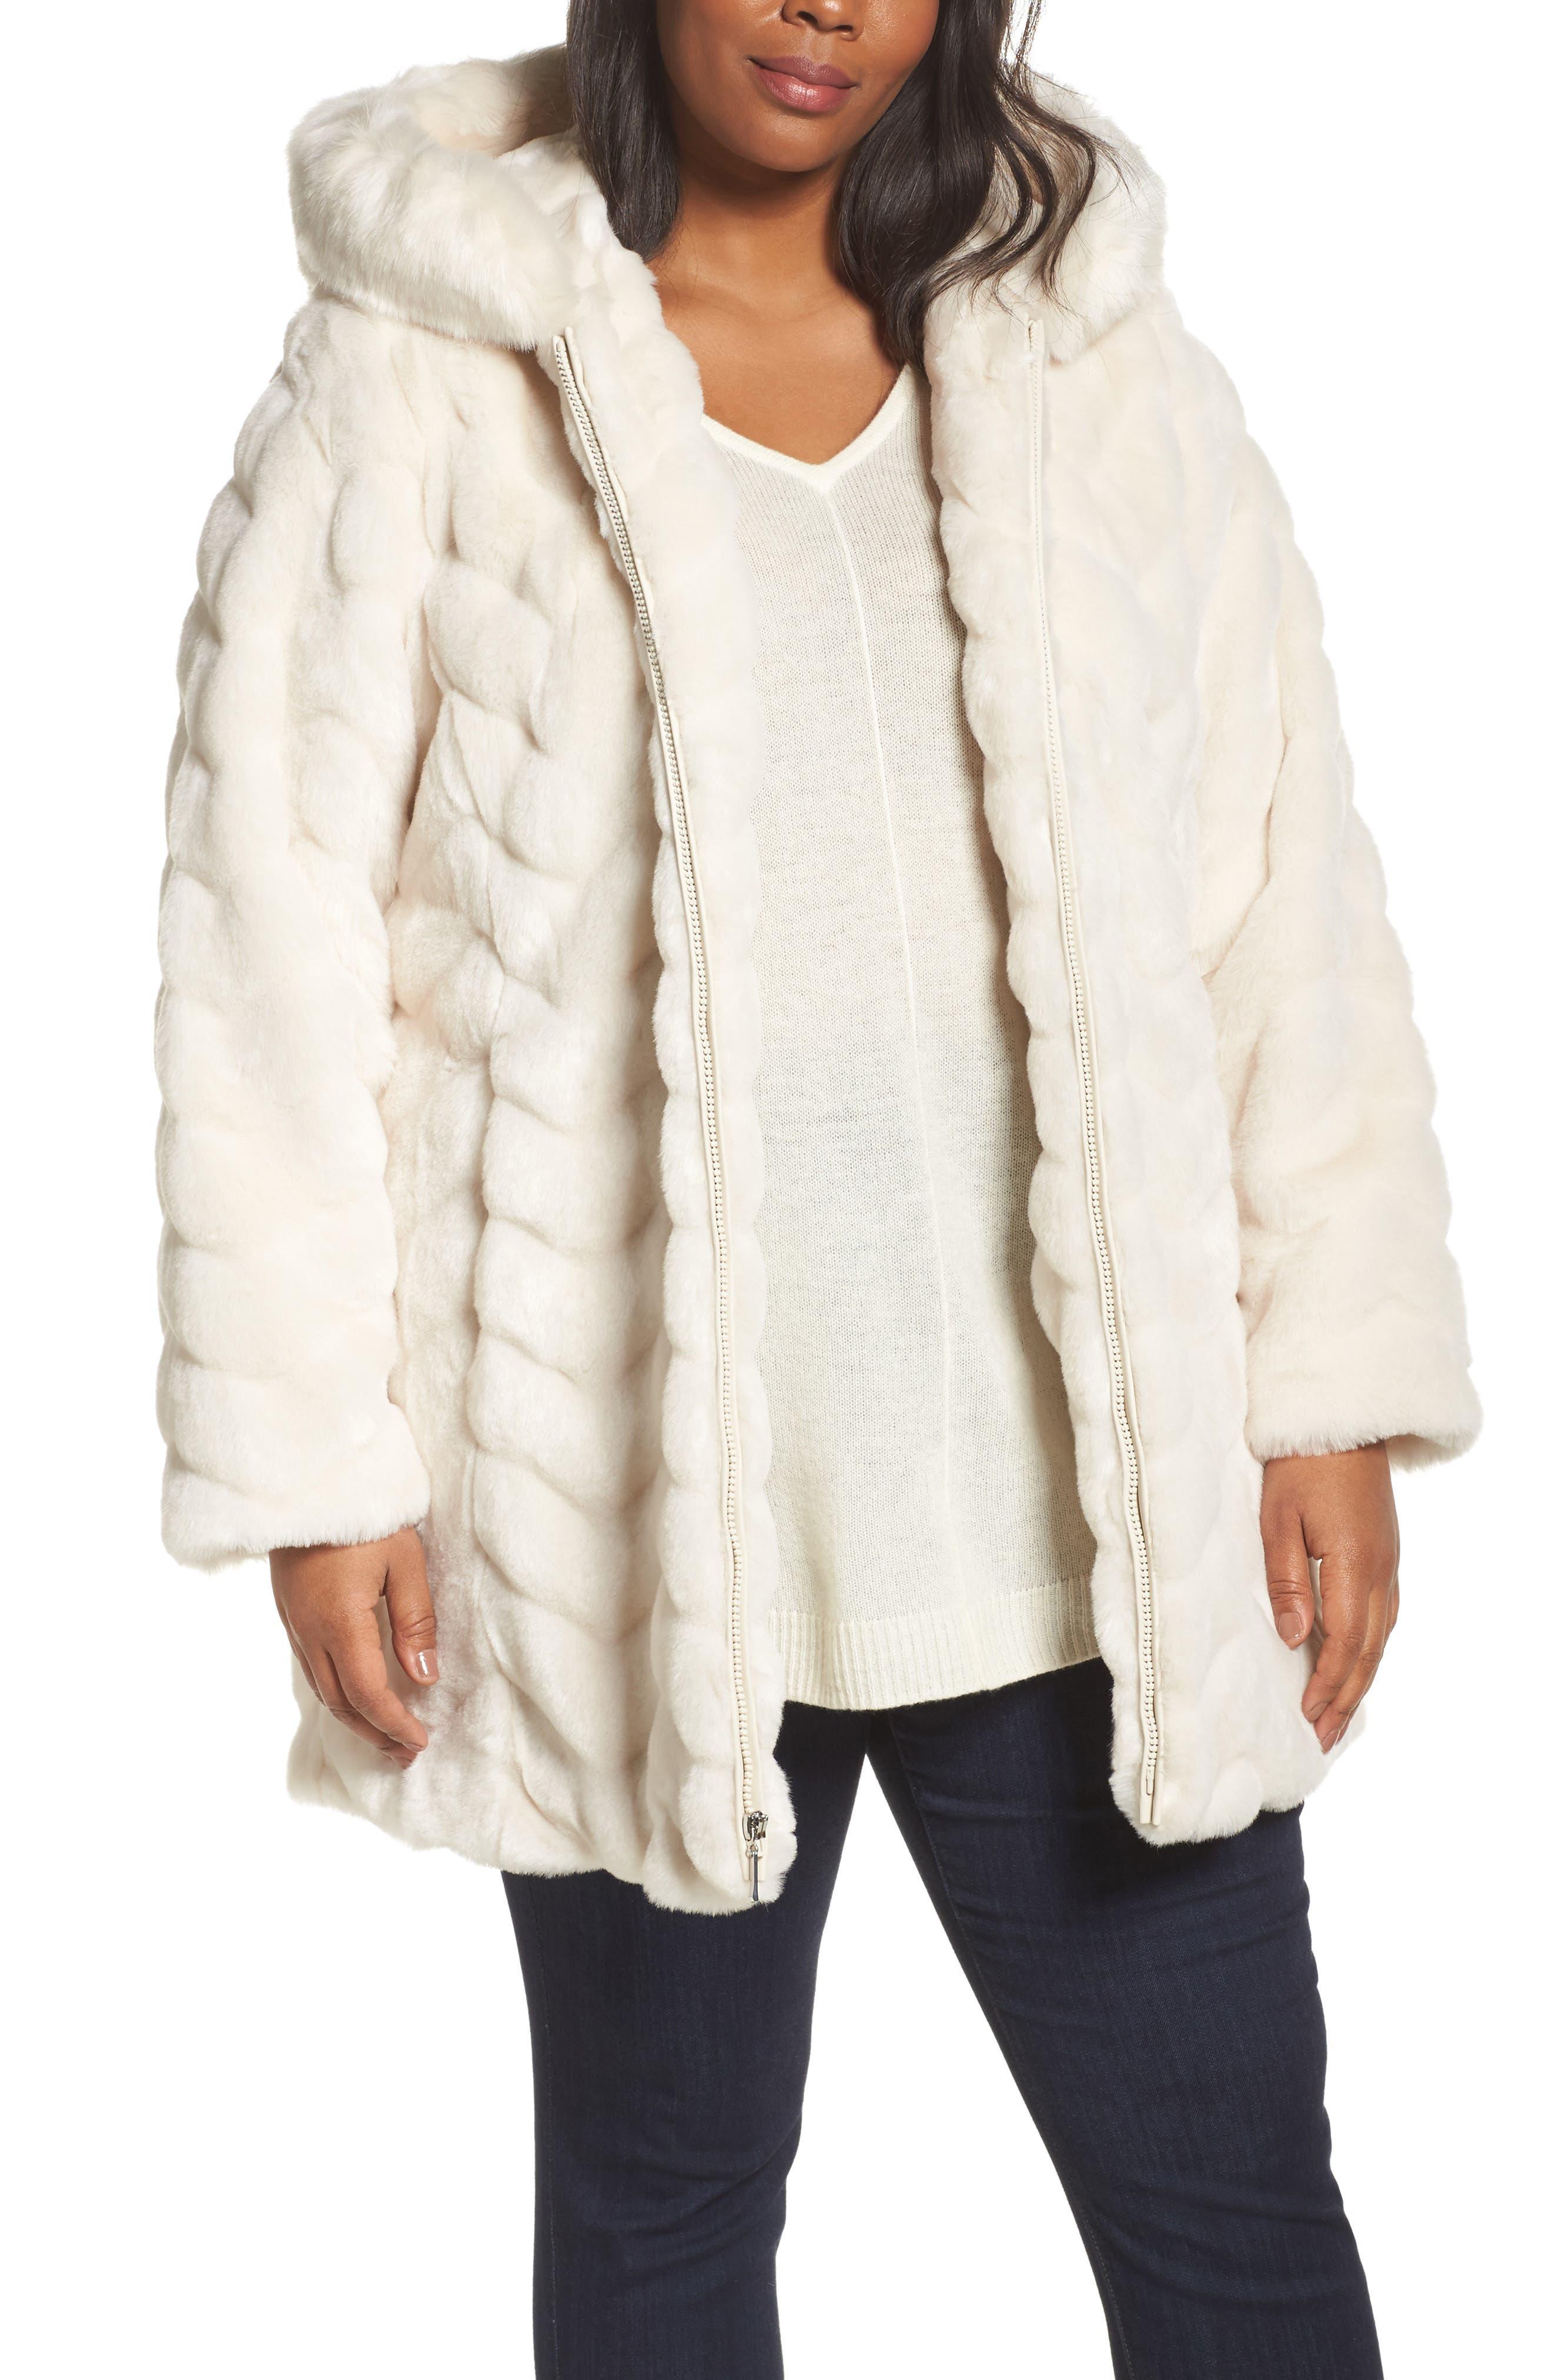 Main Image - Gallery Hooded Chevron Faux Fur Coat (Plus Size)